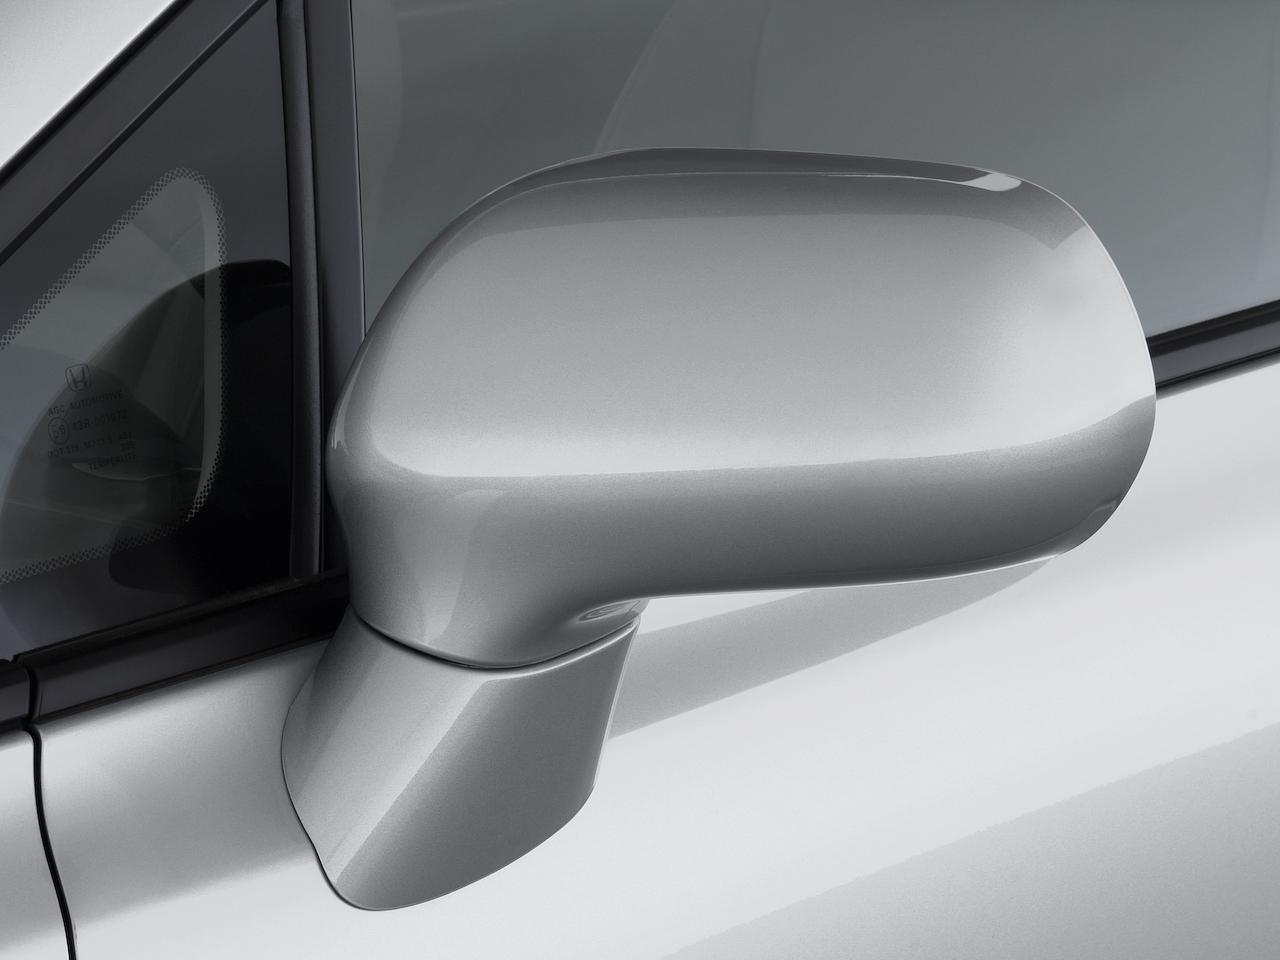 Mugen Reveals European Honda Civic Type R